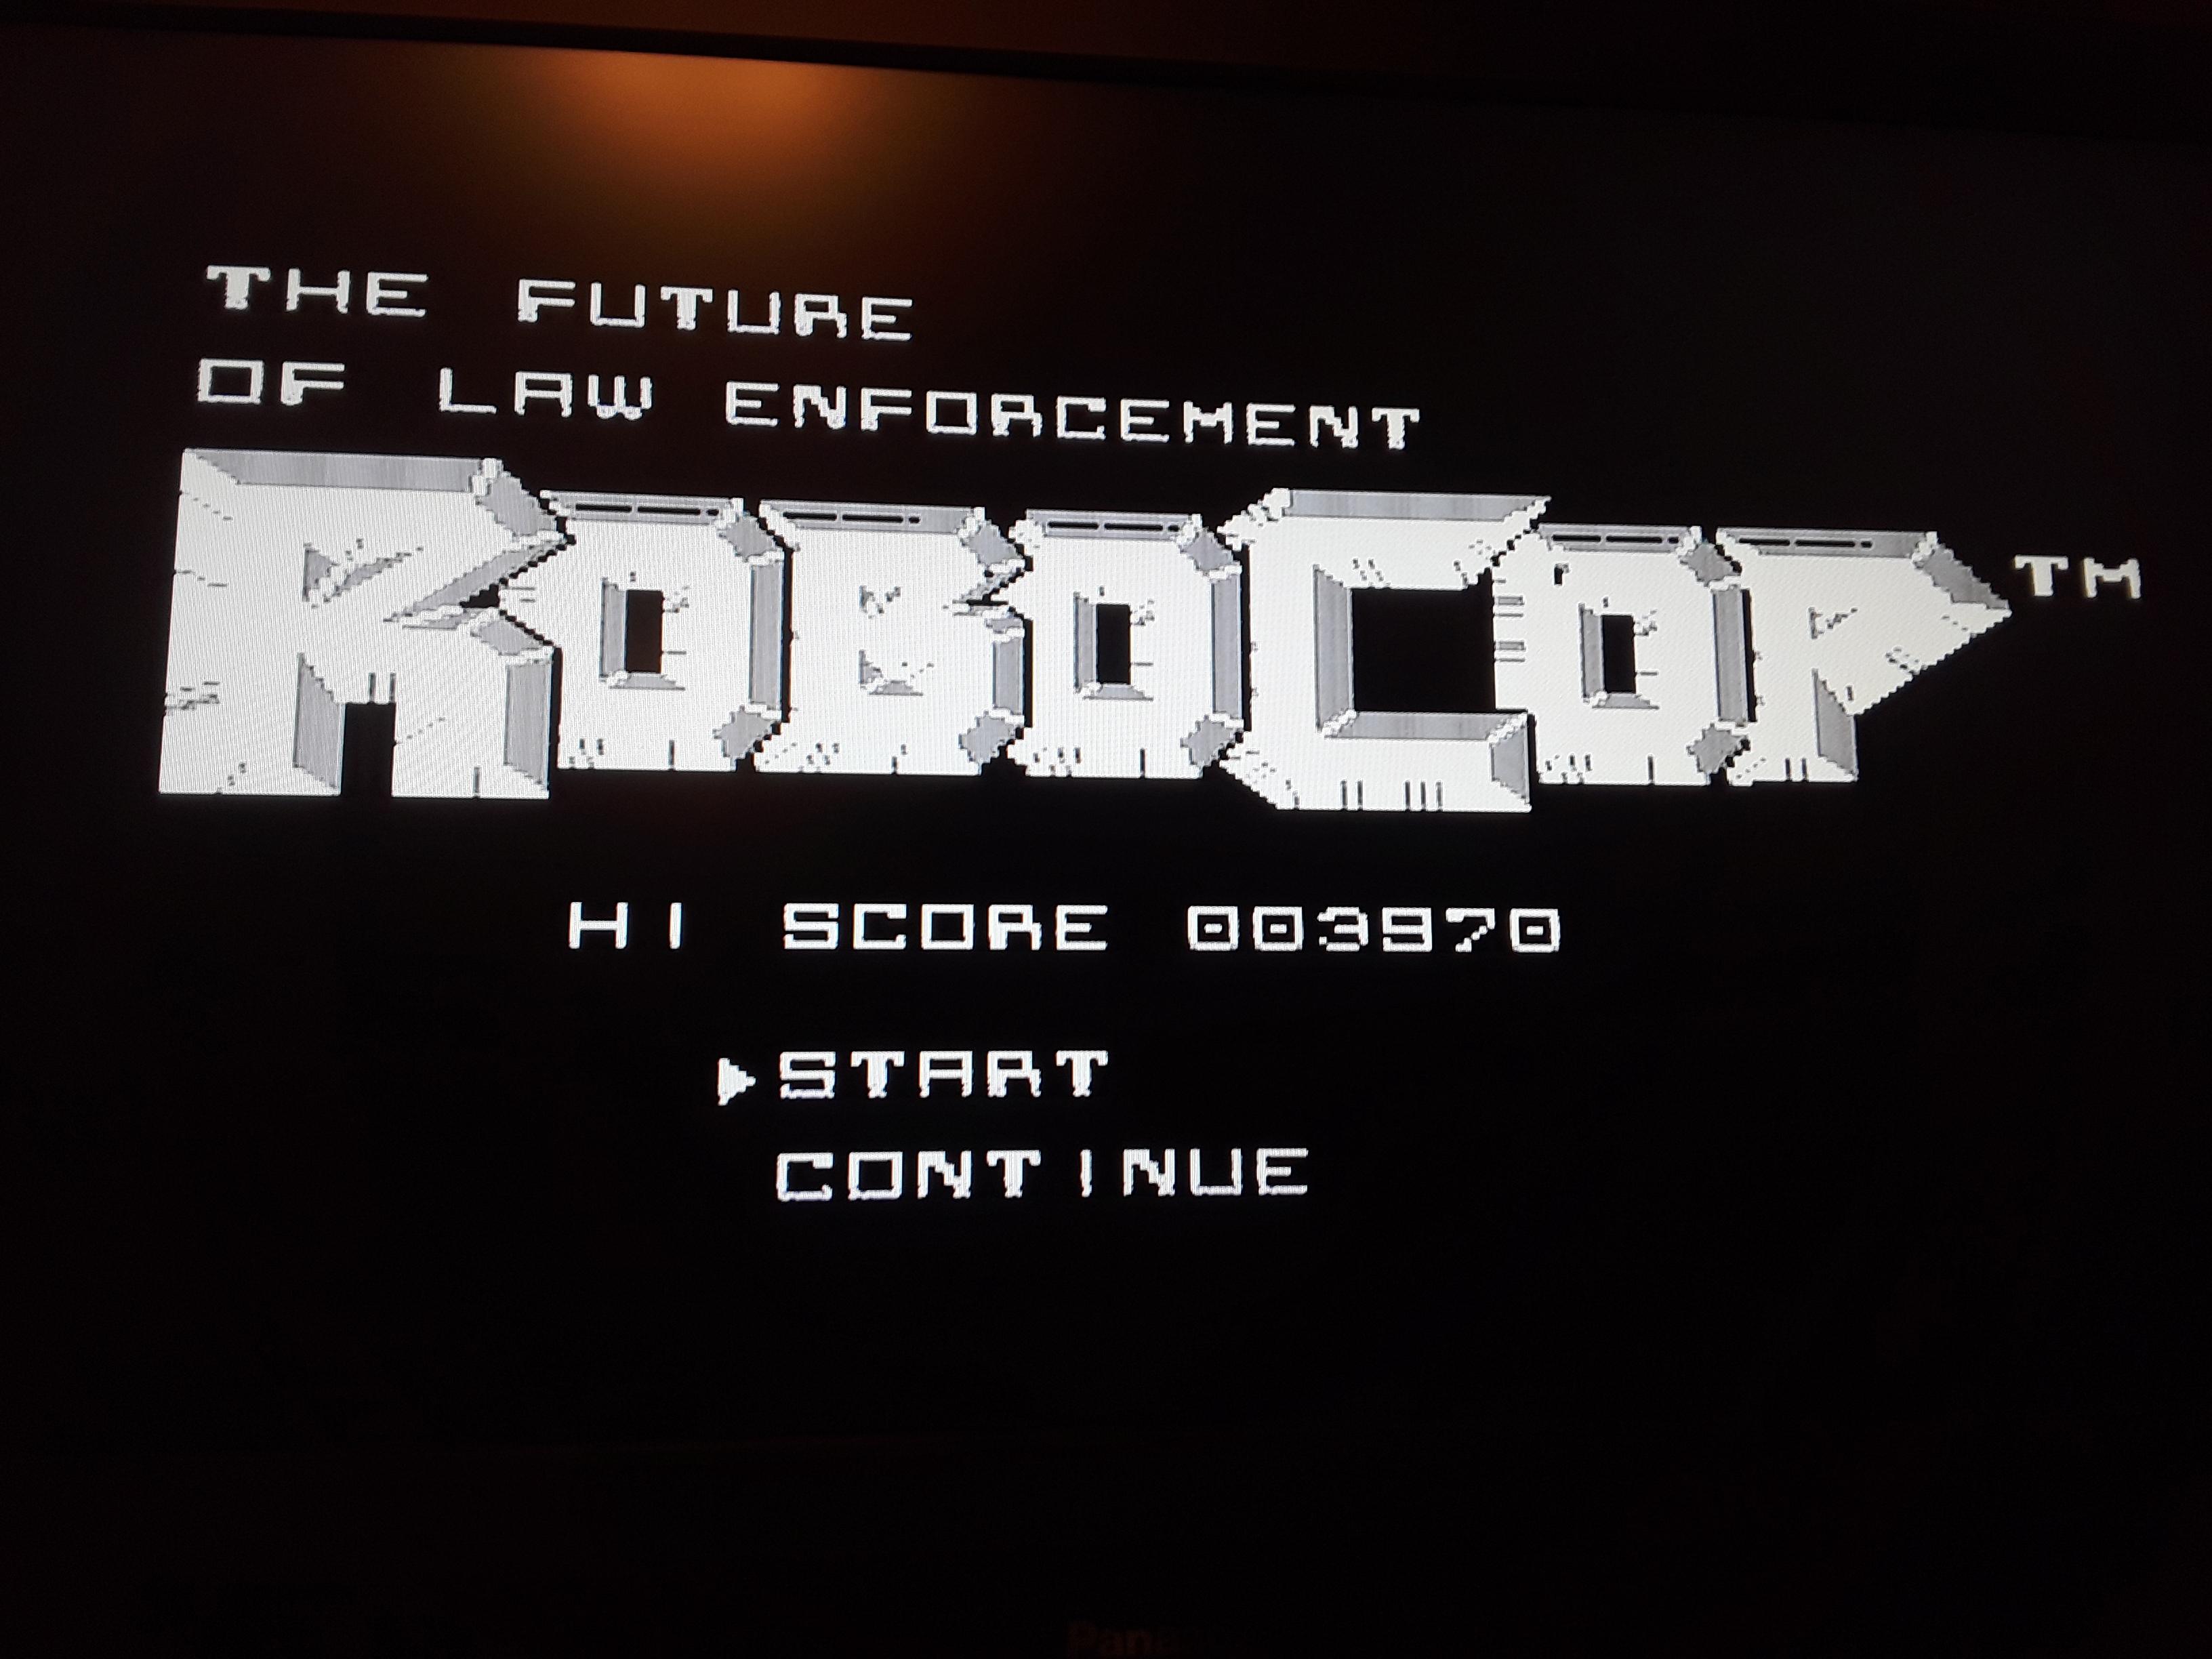 RoboCop 3,970 points